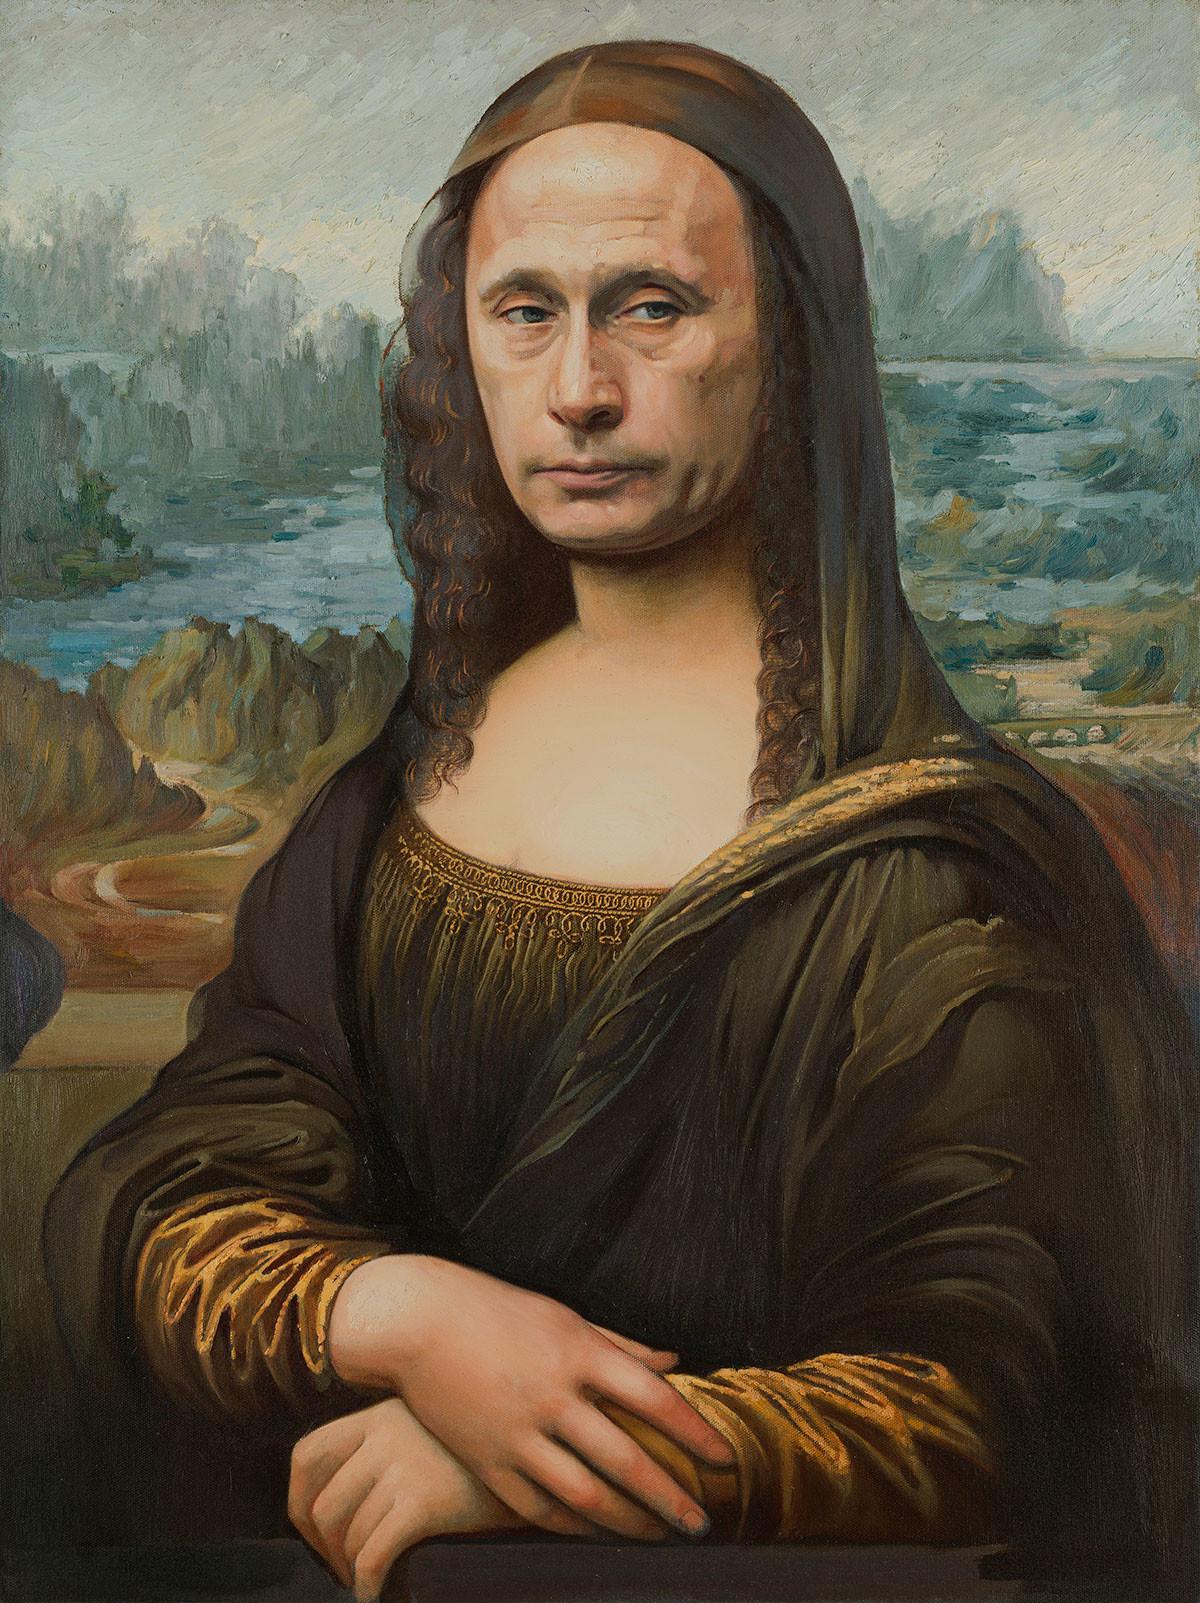 Alexander Kosolapov. Mona Lisa, 2020